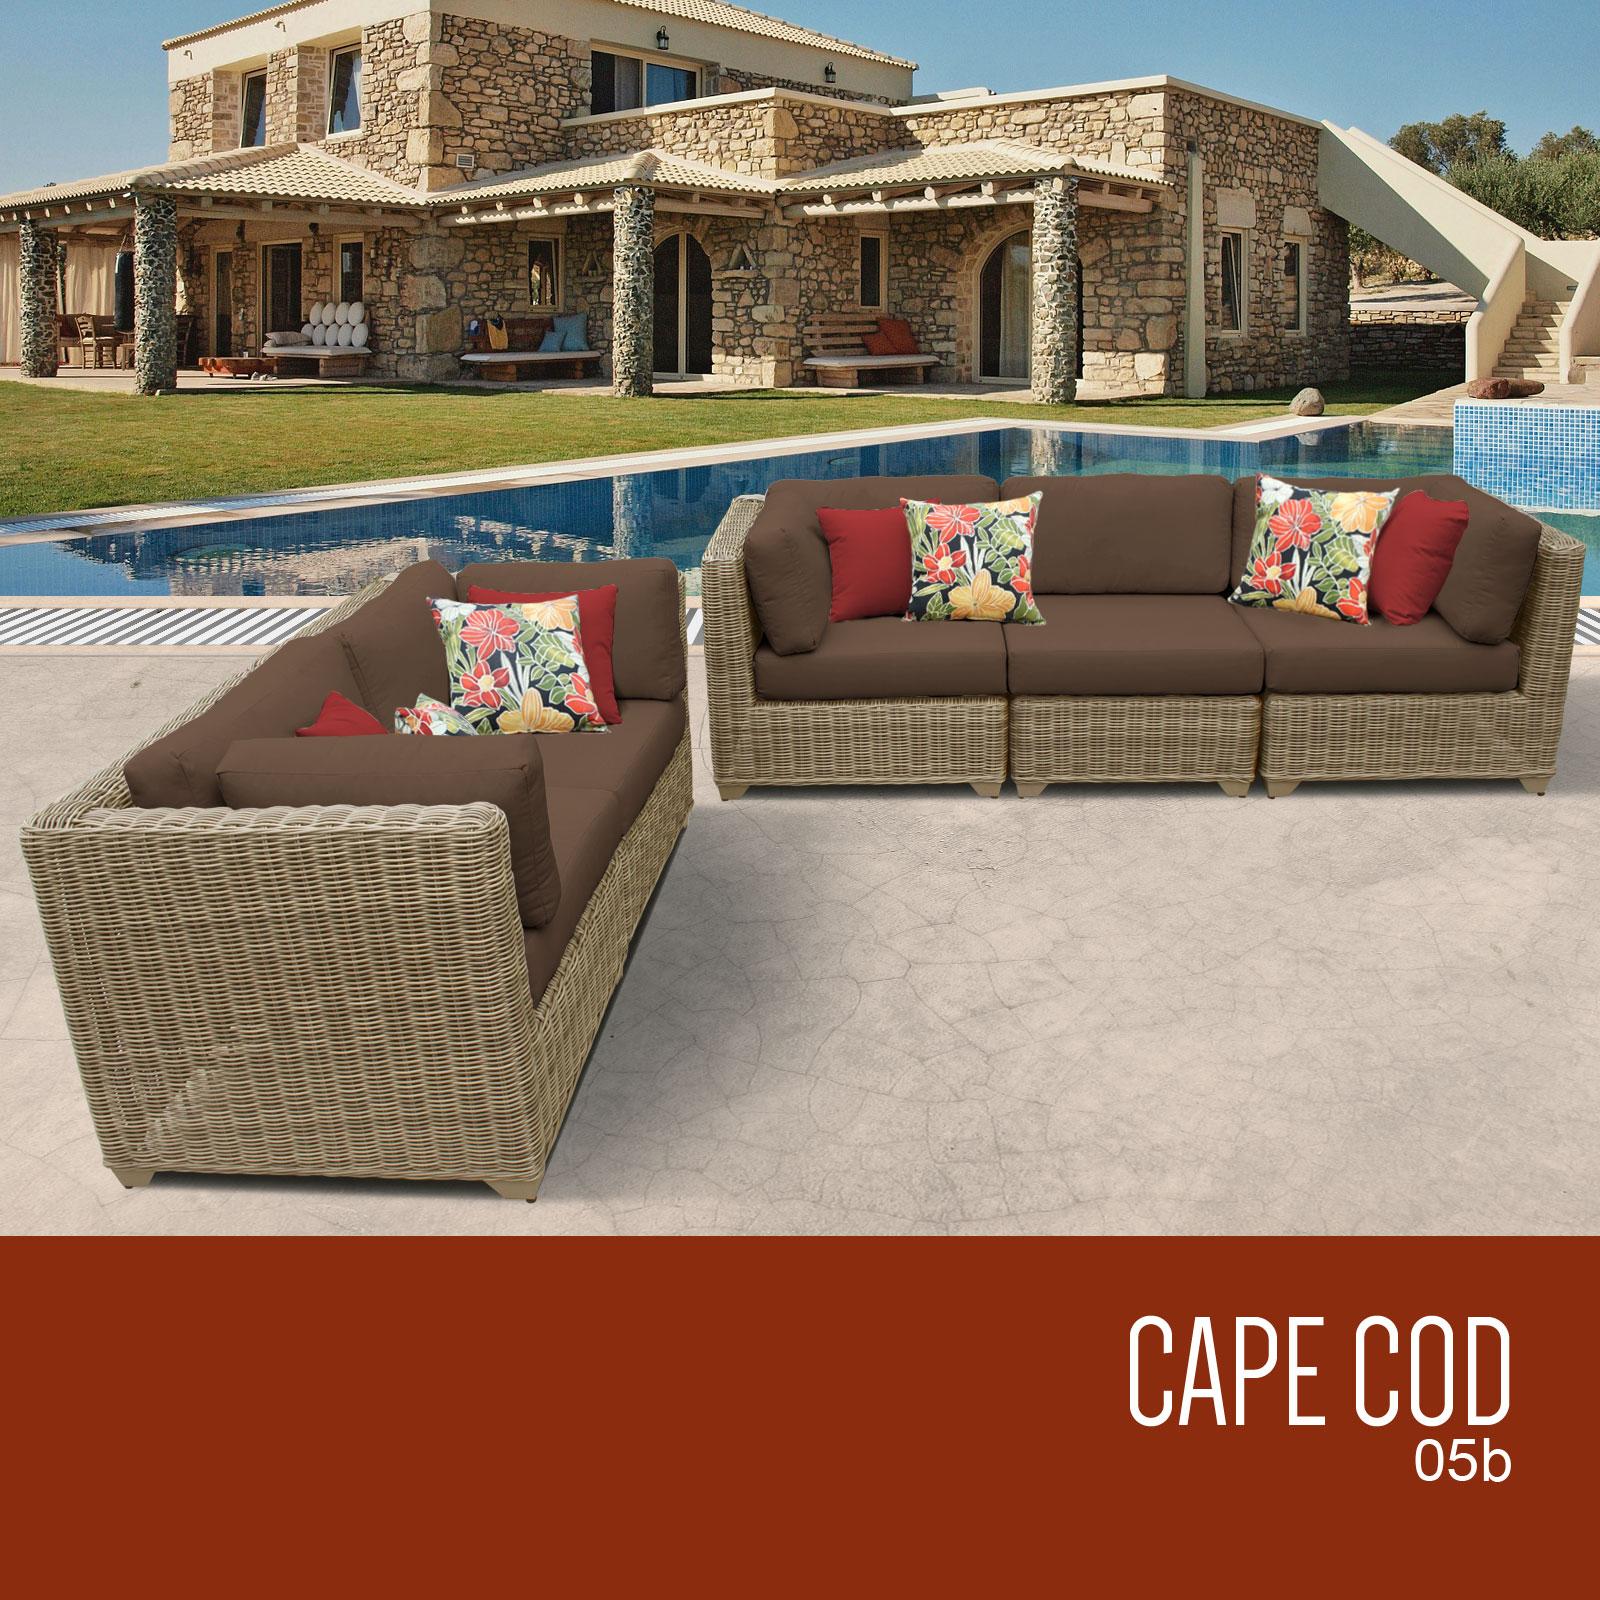 Cape Cod 5 Piece Outdoor Wicker Patio Furniture Set 05b